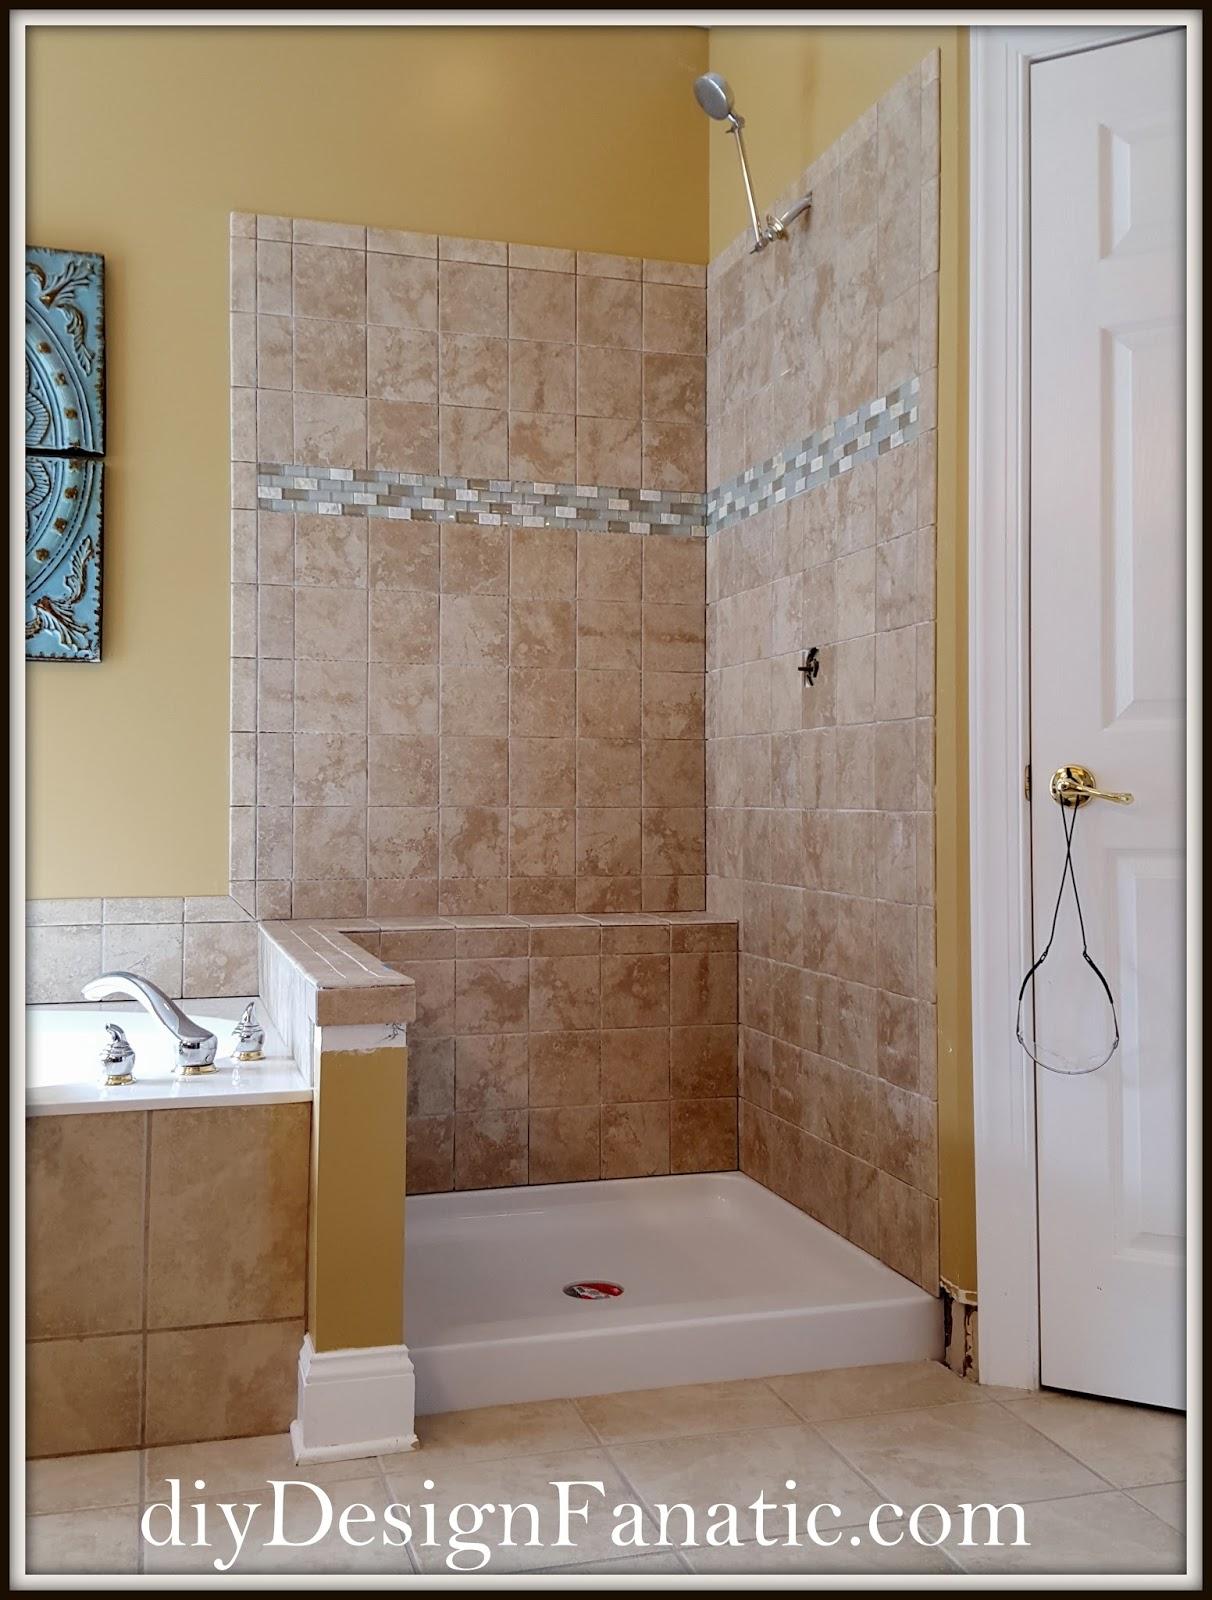 diy Design Fanatic: Updated Master Bath Shower Reveal